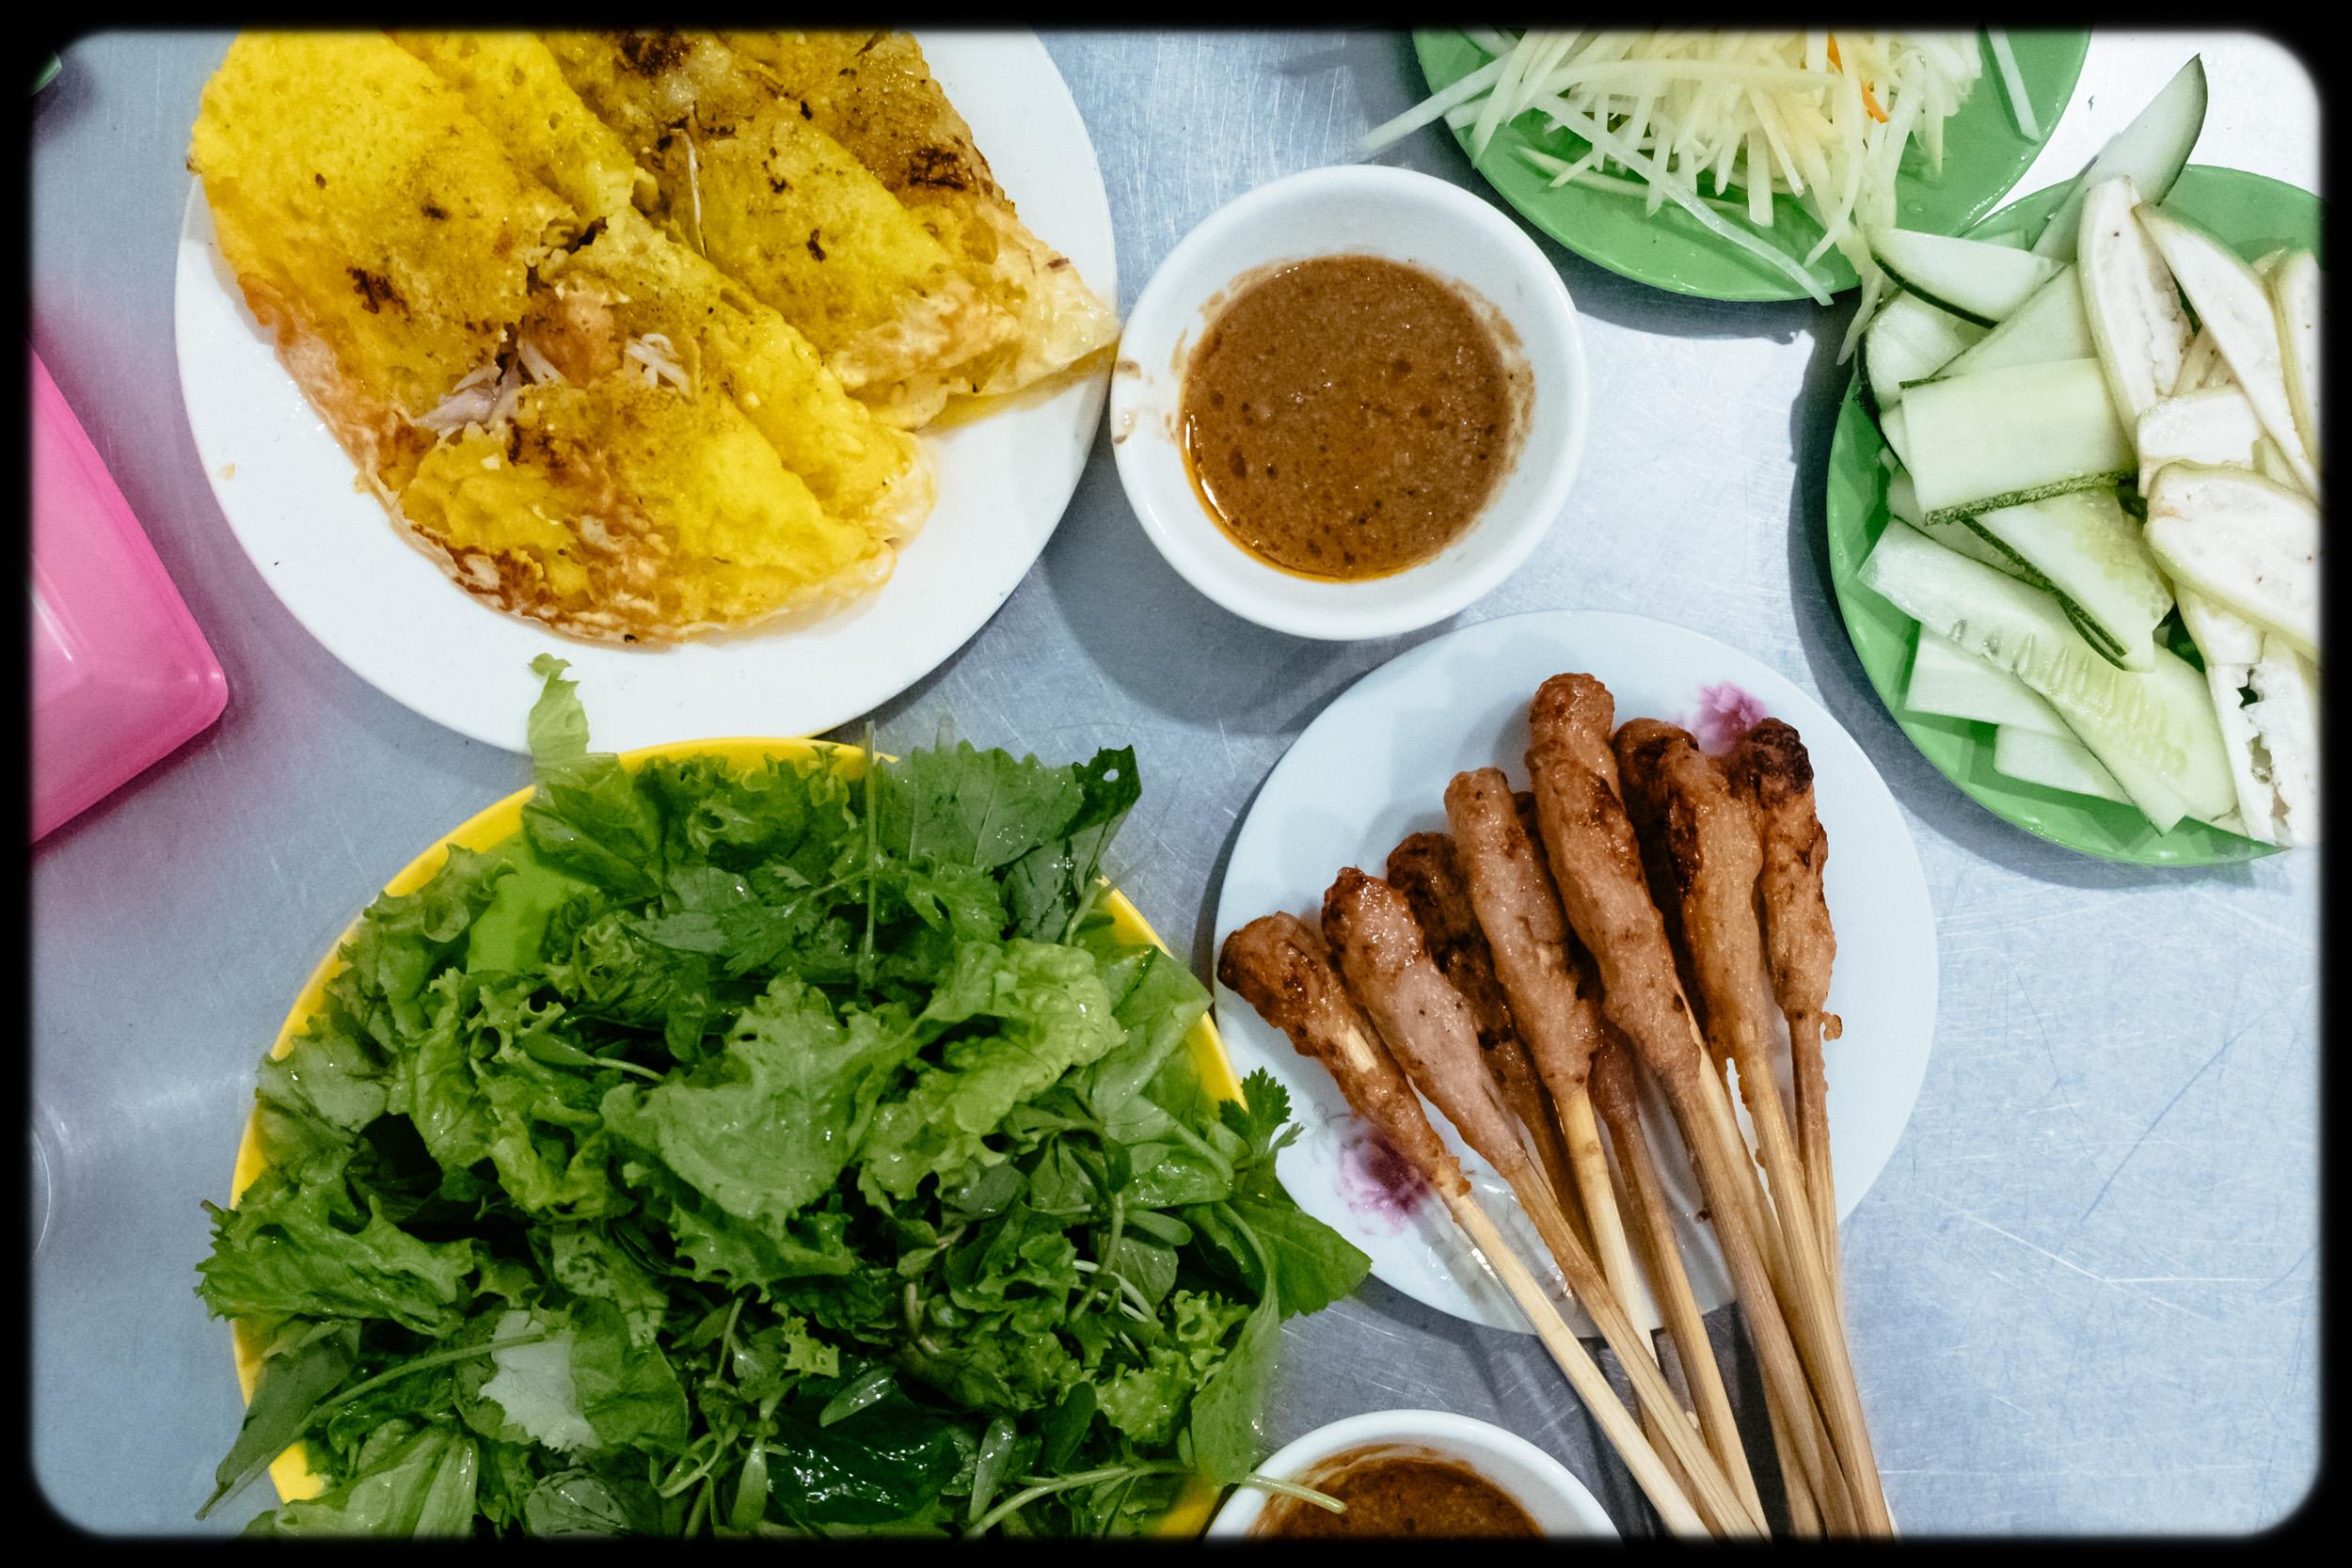 banh xeo, with pork liver peanut sauce